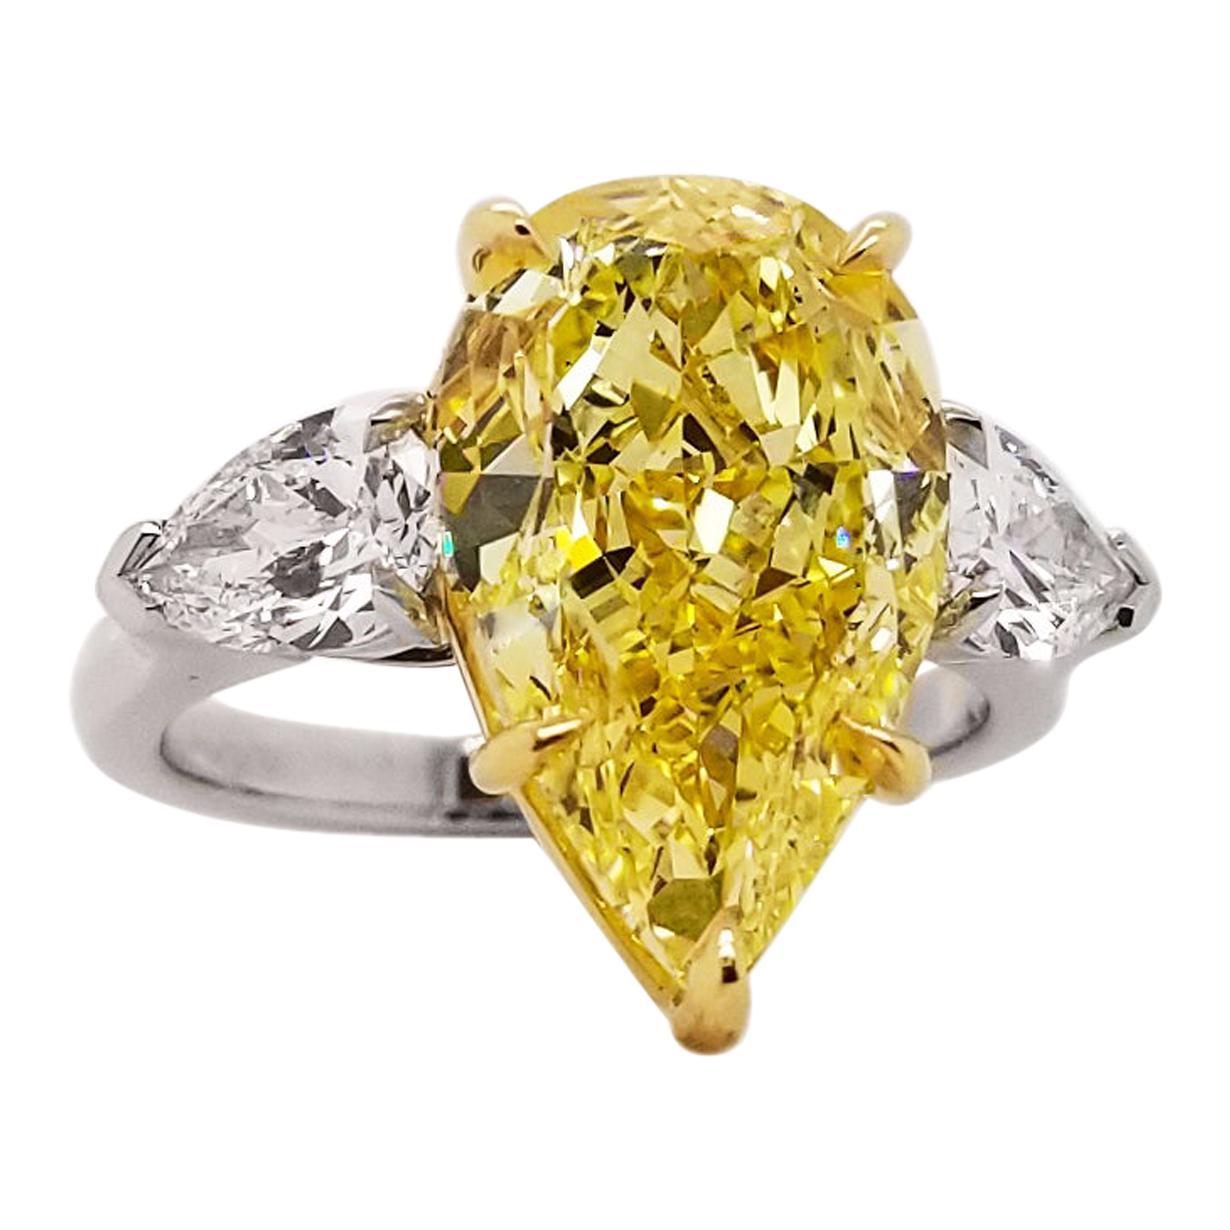 Scarselli 6 Carat Pear Shape Fancy Intense Yellow Diamond Engagement Ring